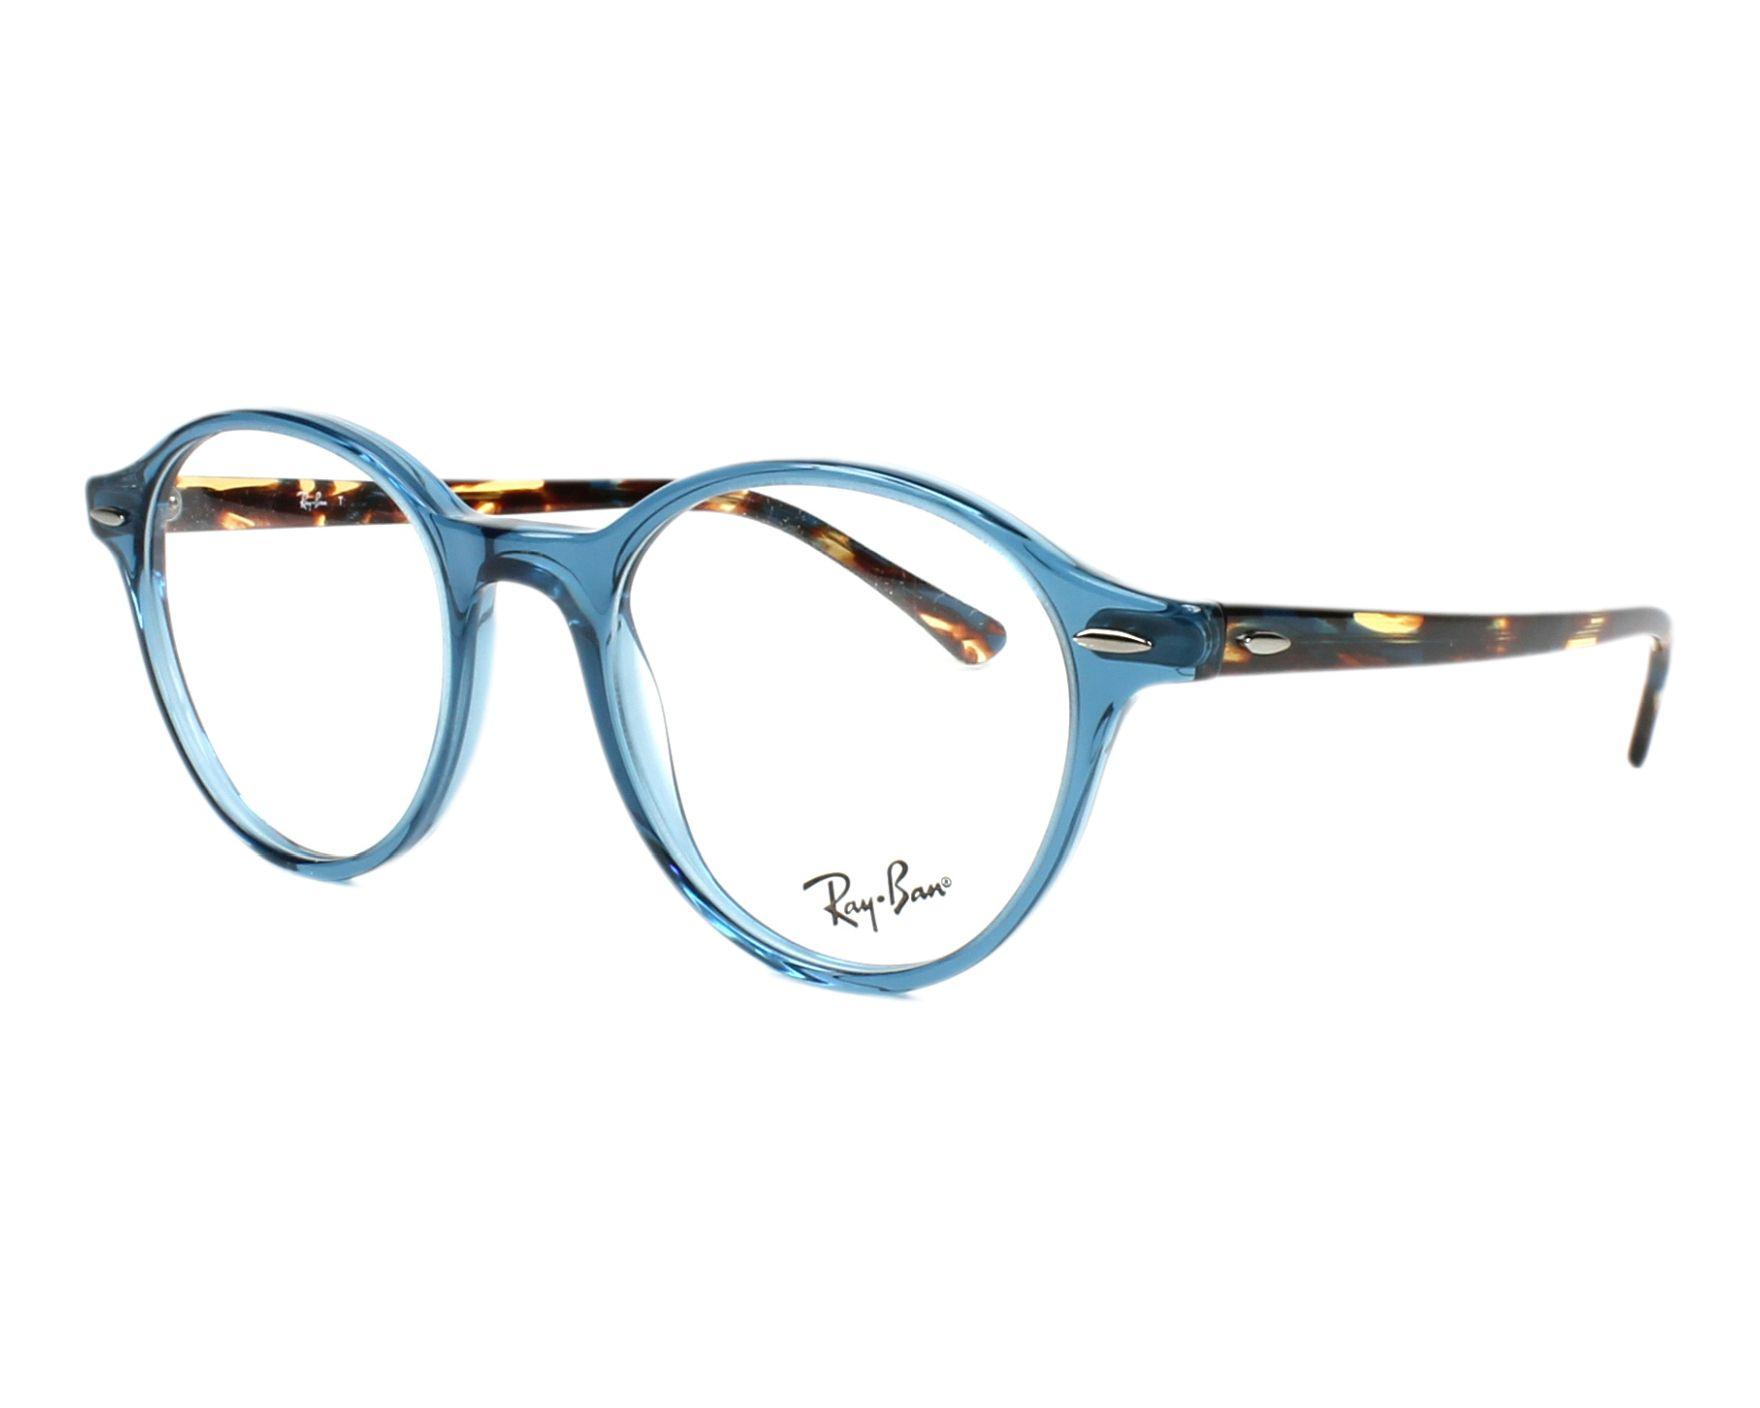 b7fde13dd9e eyeglasses Ray-Ban RX-7118 8022 48-19 Blue Havana profile view